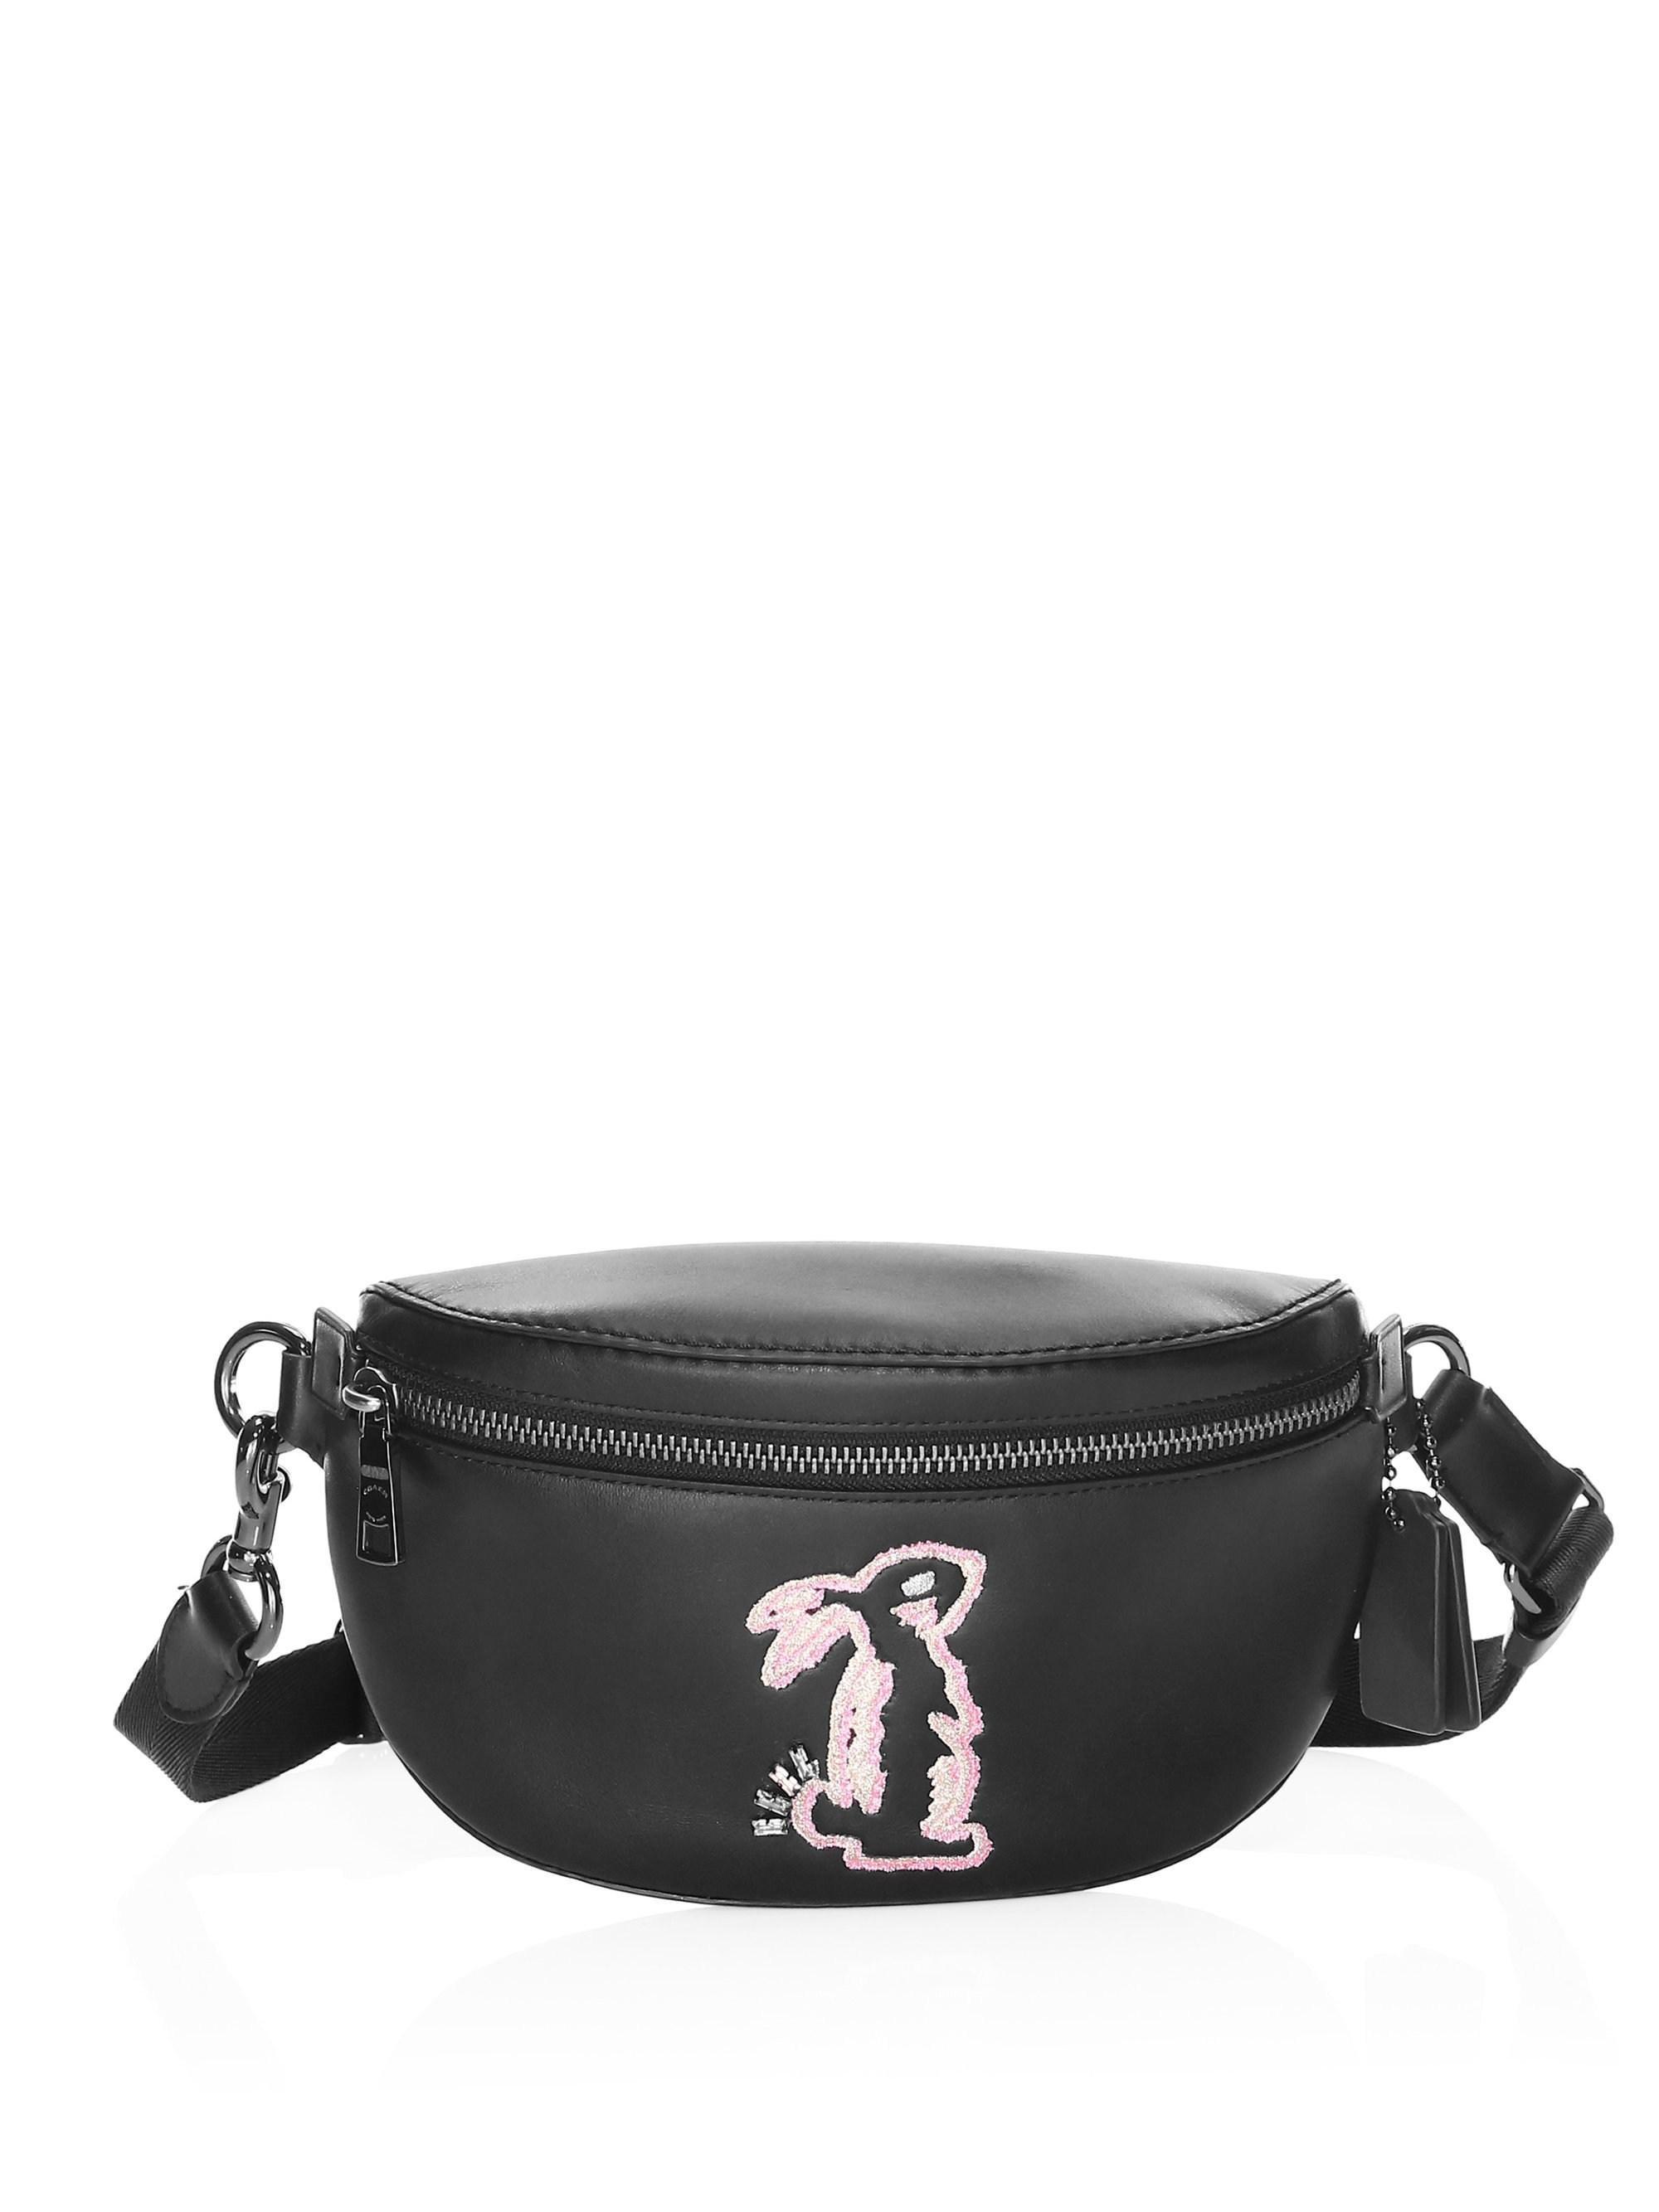 43a4c741a32a COACH X Selena Gomez Bunny Belt Bag in Black - Lyst